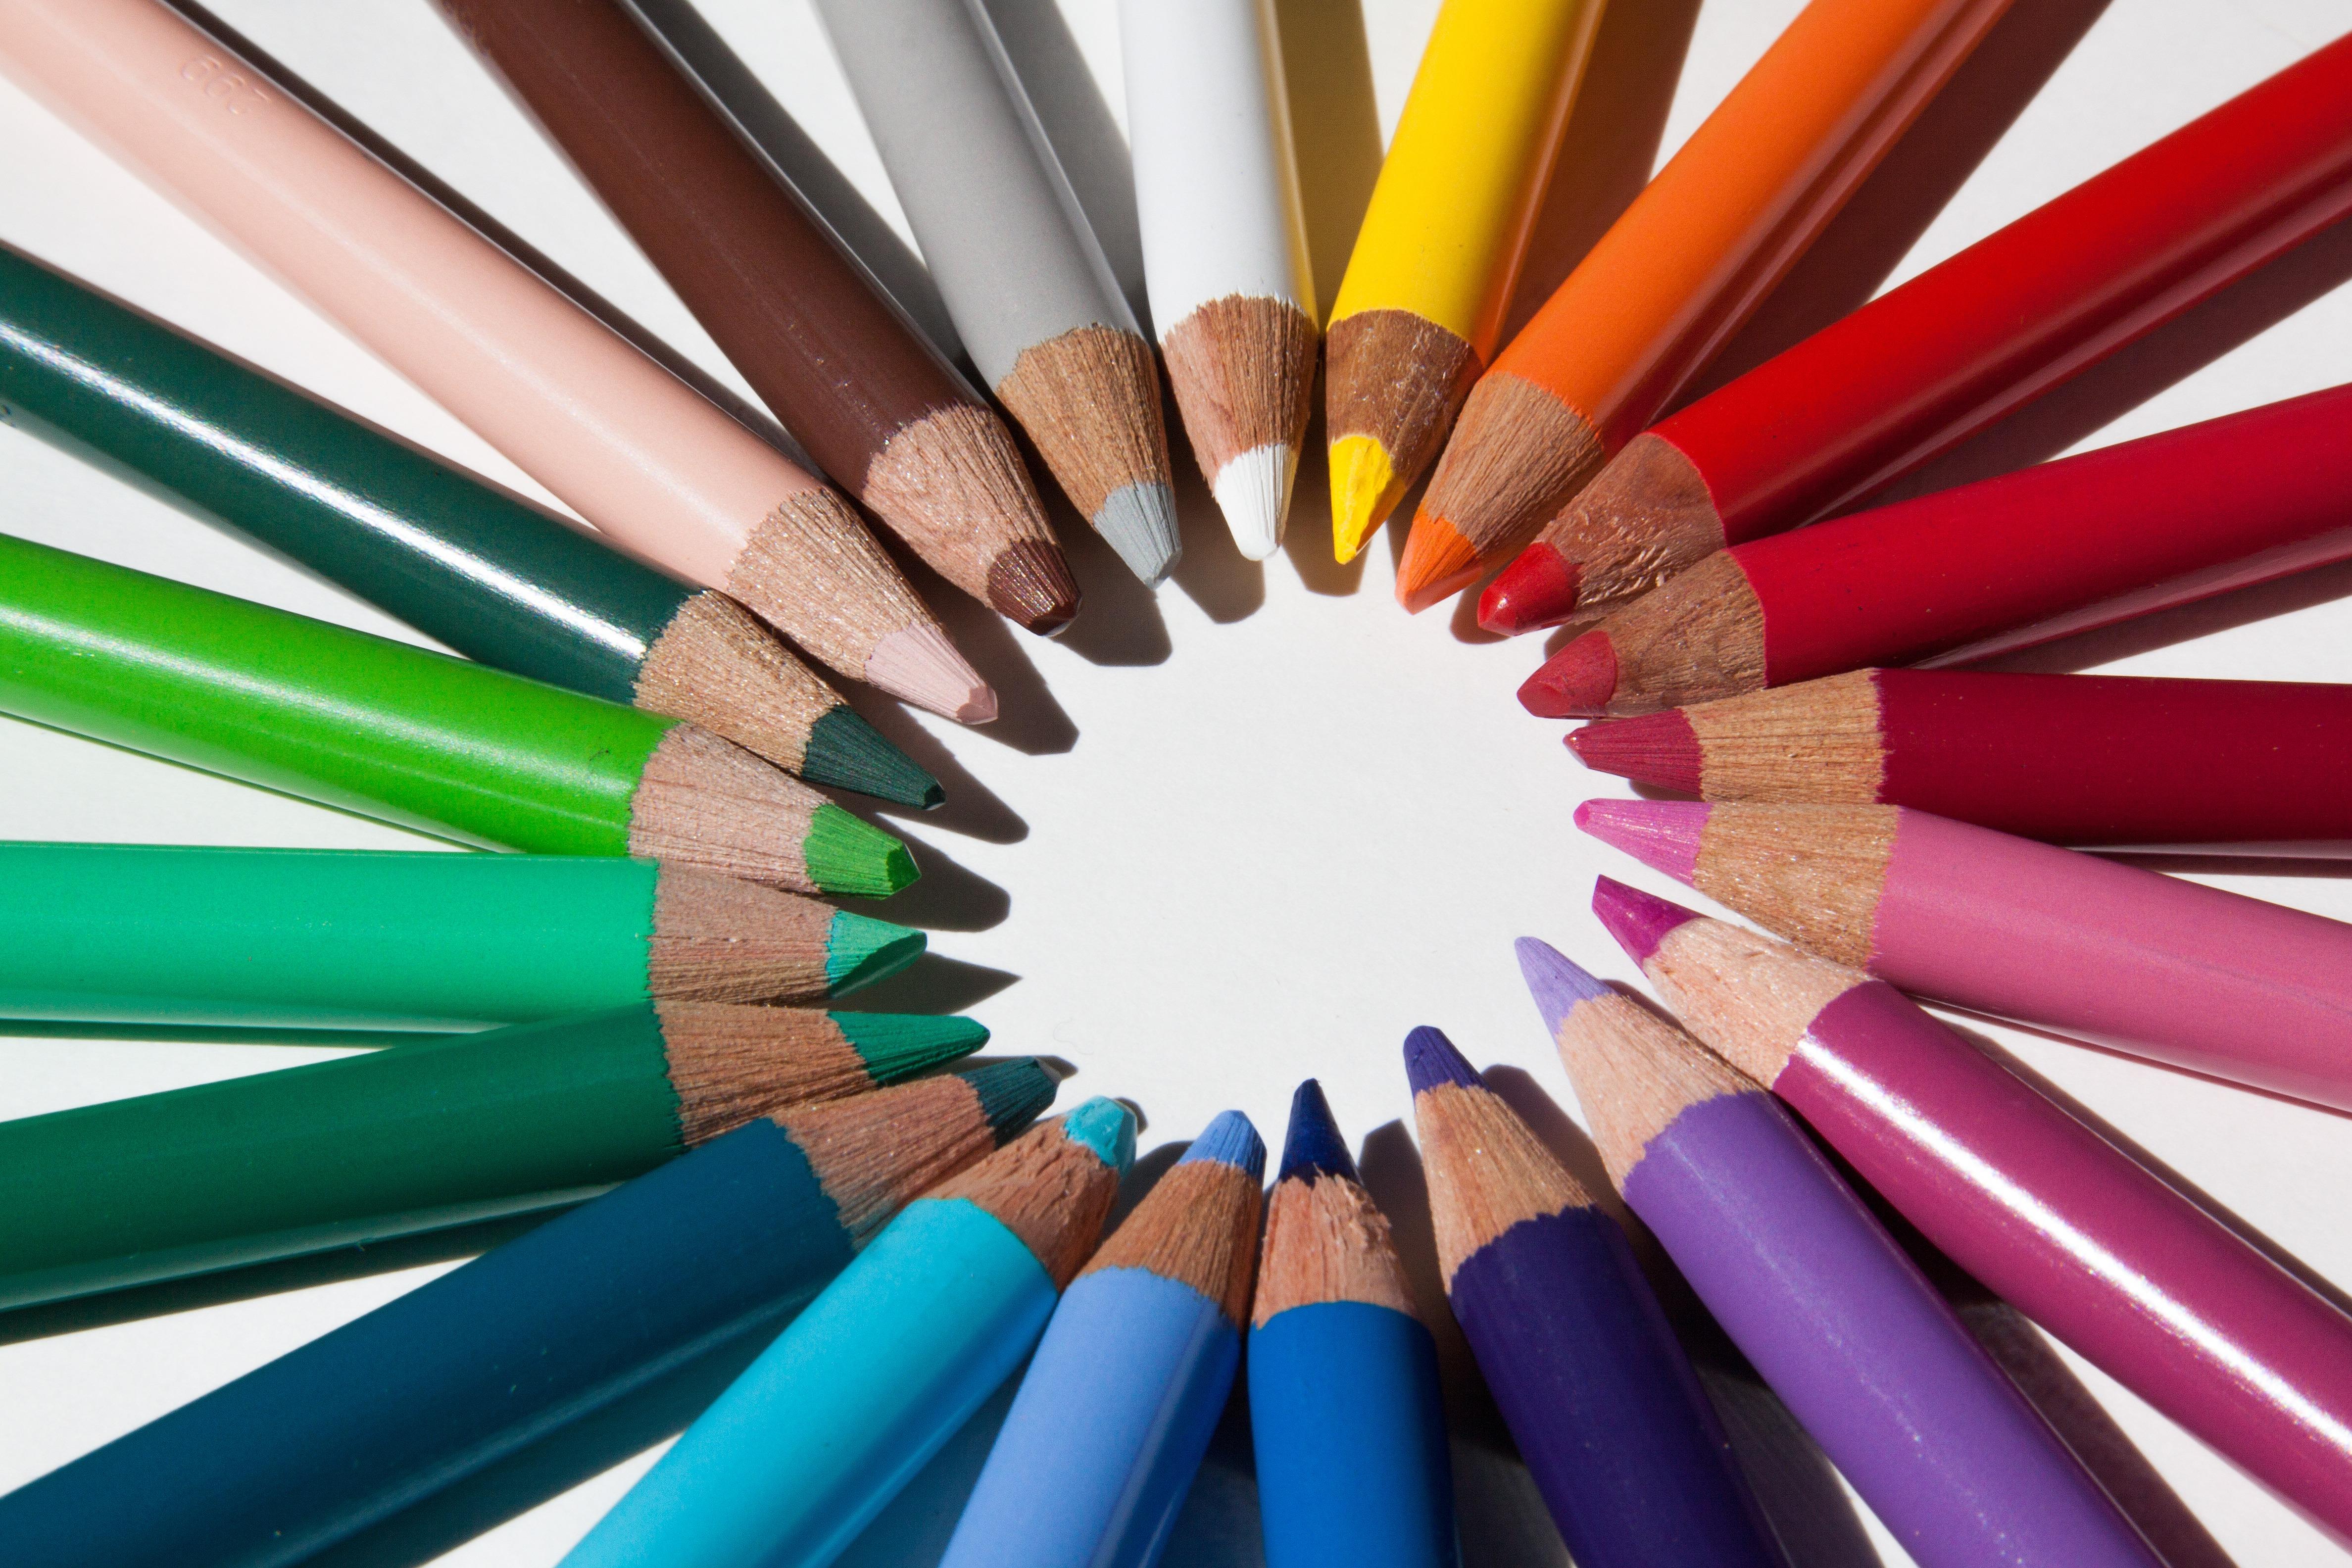 Gambar Bintang Warna Warni Merapatkan Sketsa Seri Bentuk